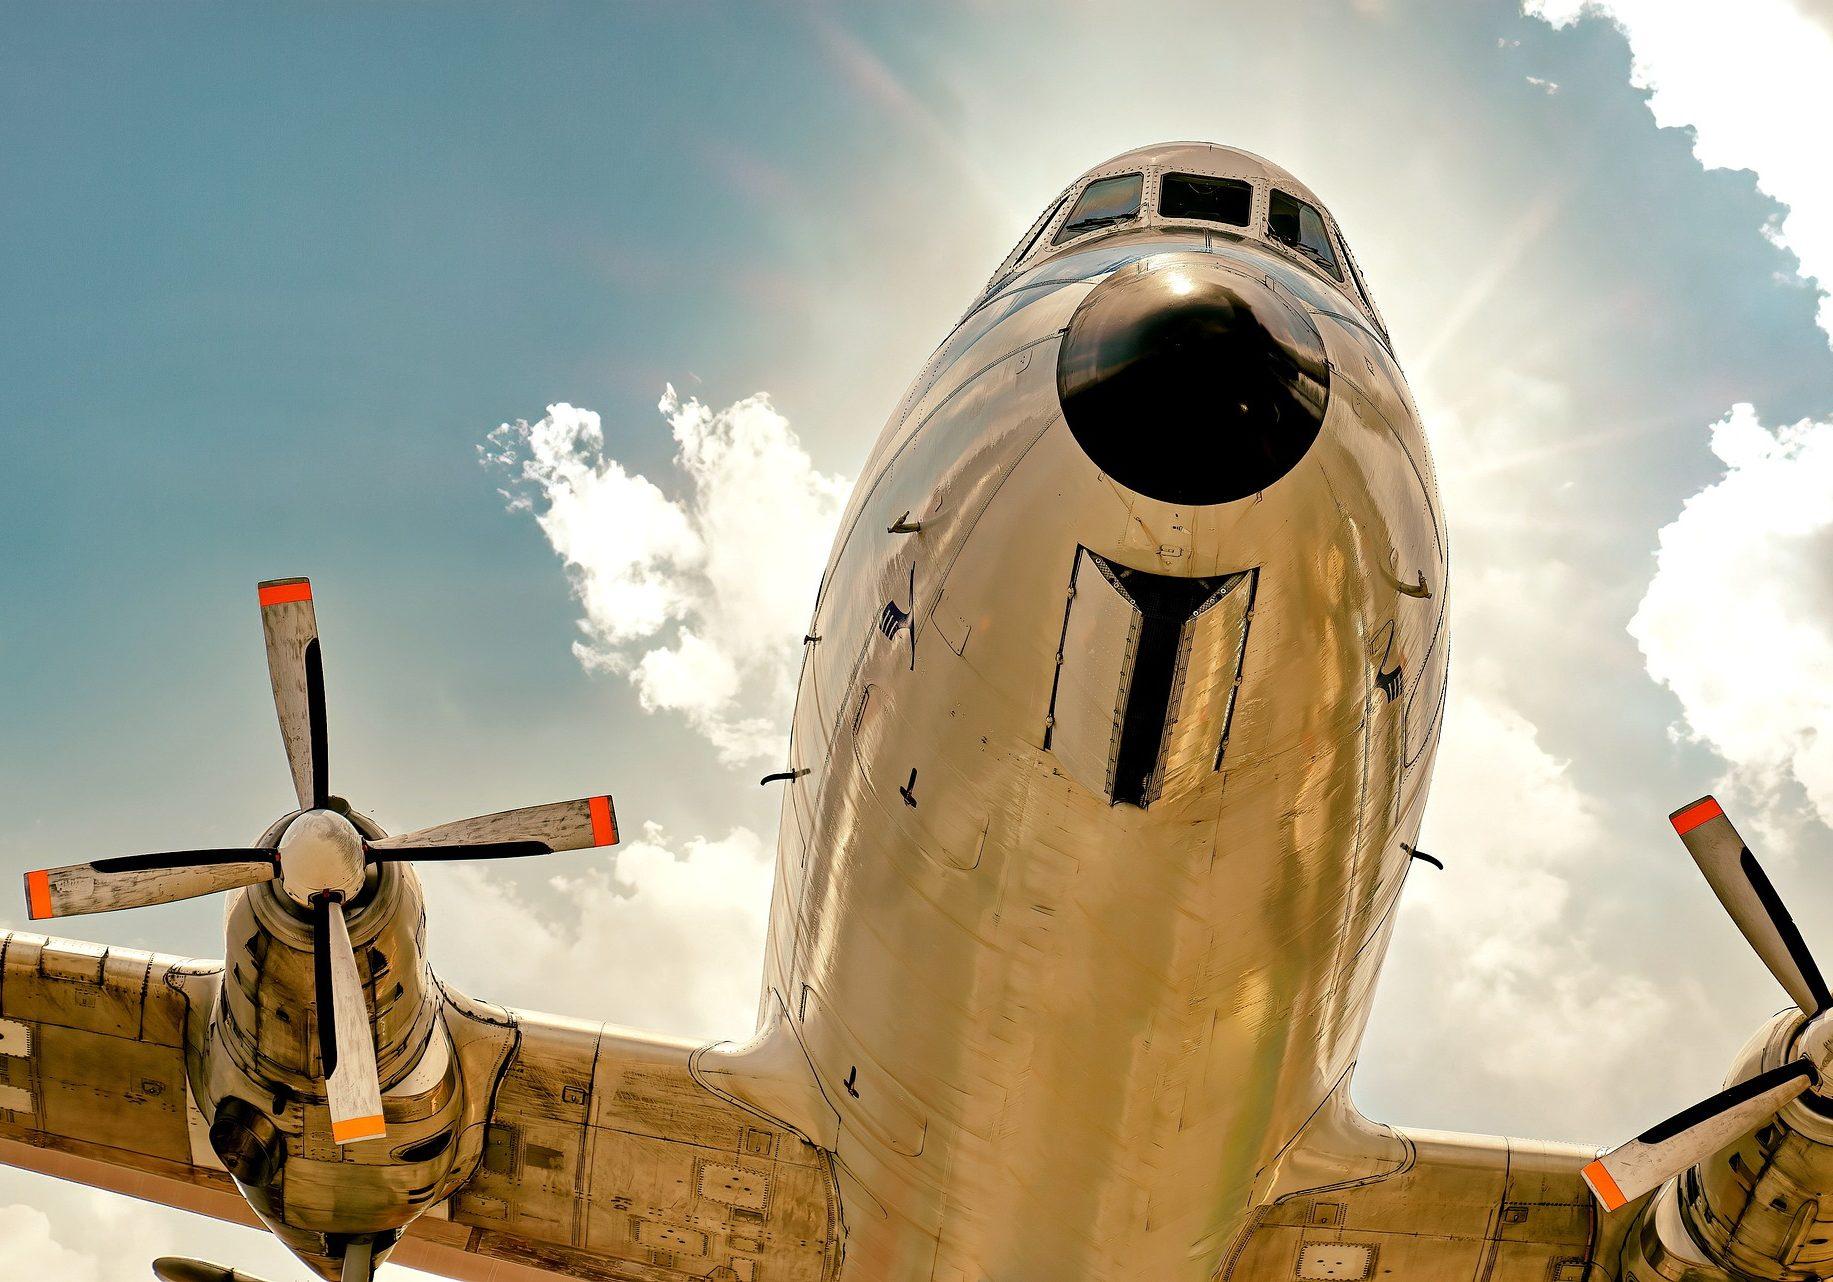 plane-6559698_1920